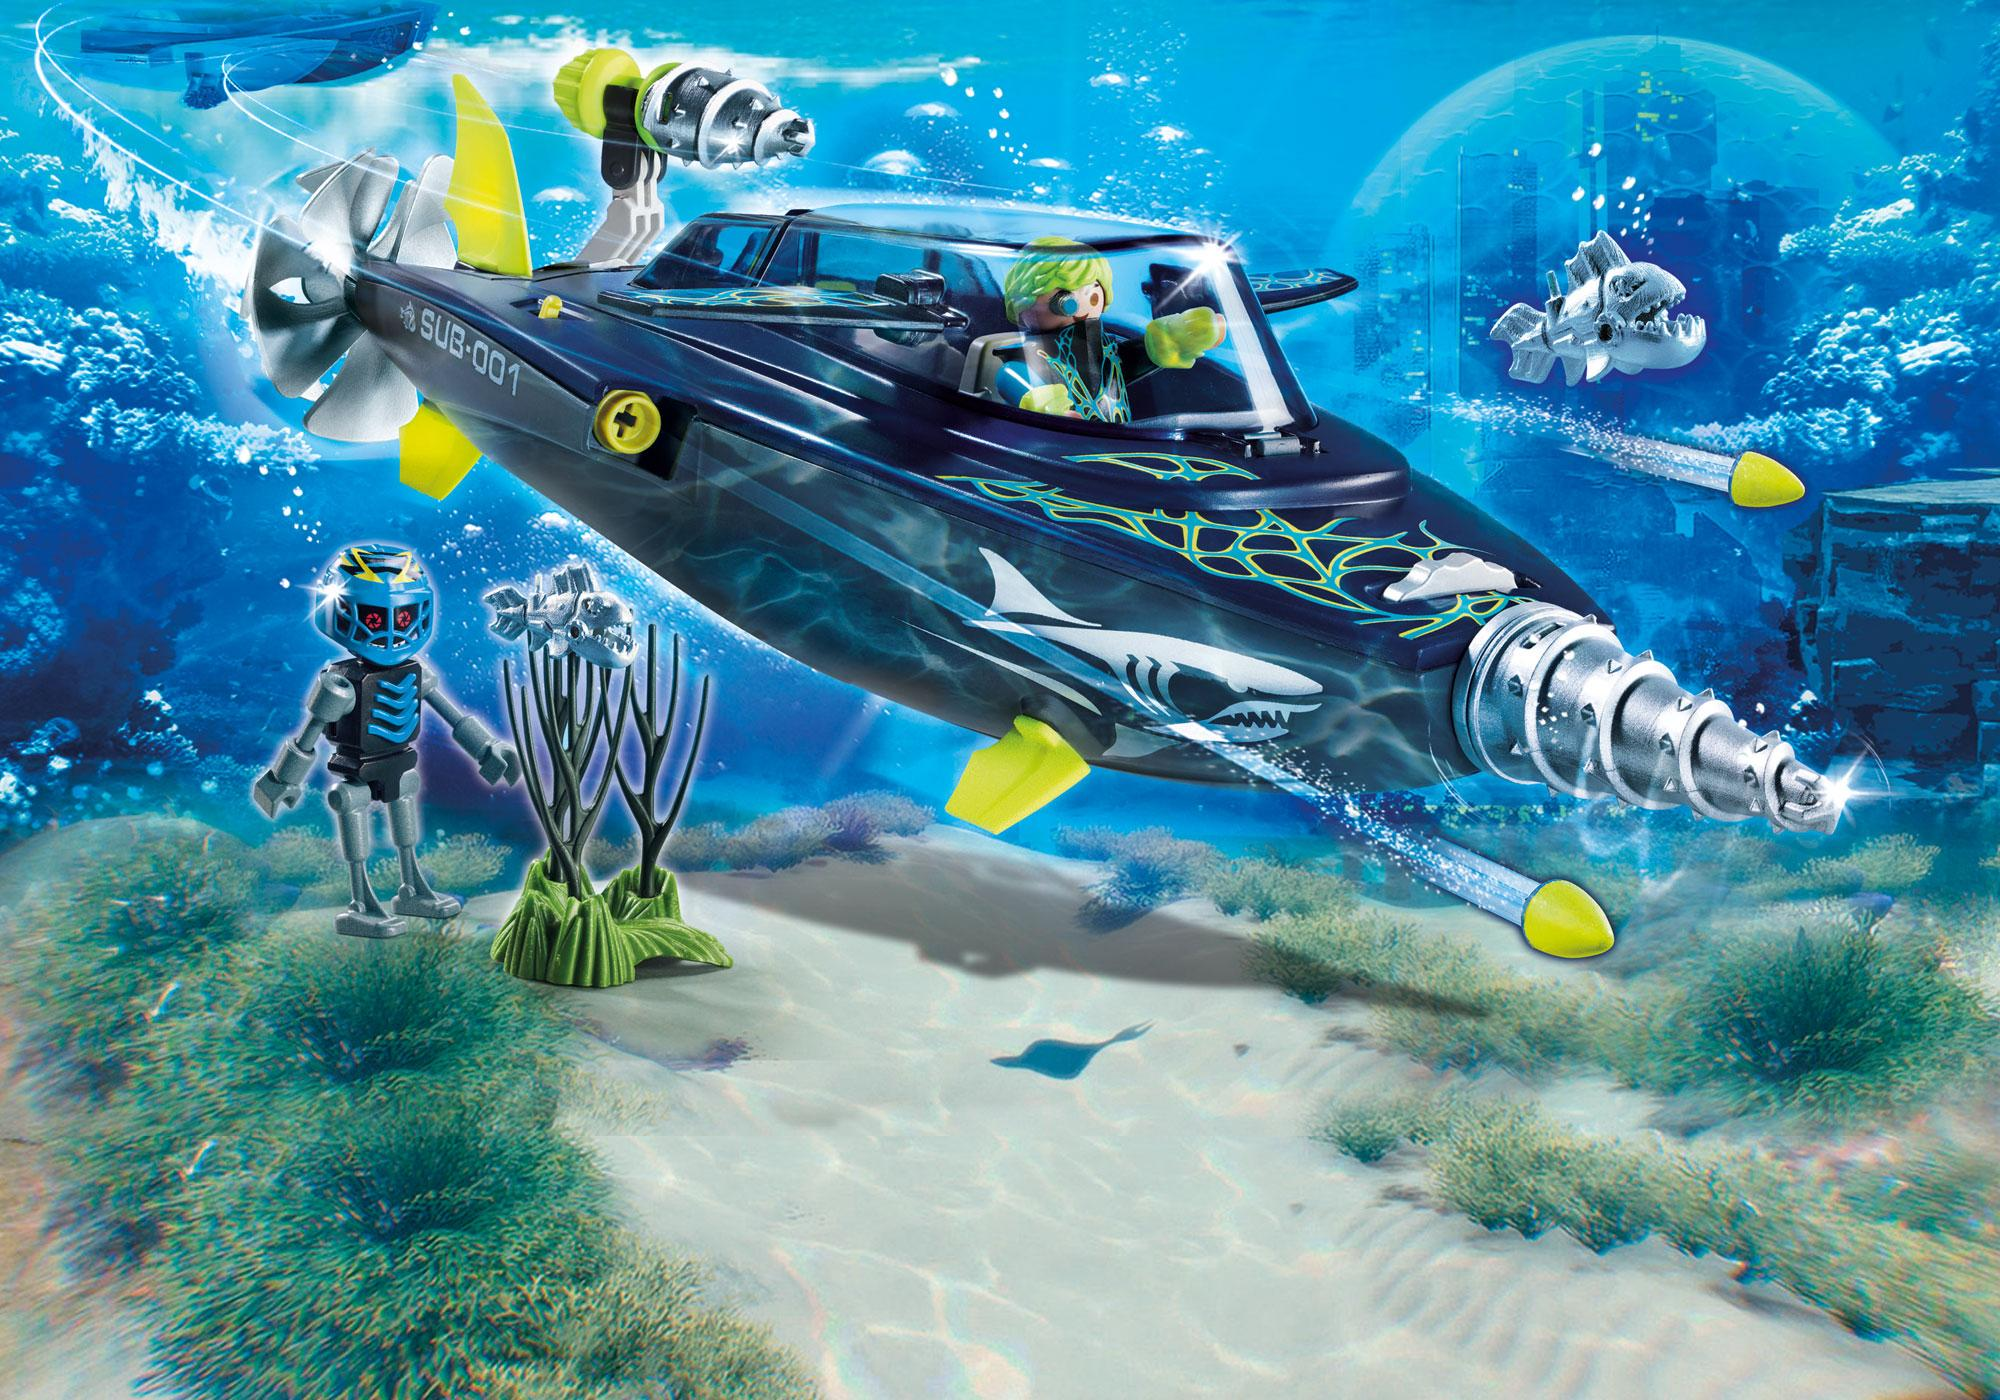 http://media.playmobil.com/i/playmobil/70005_product_detail/TEAM S.H.A.R.K. Drill Destroyer